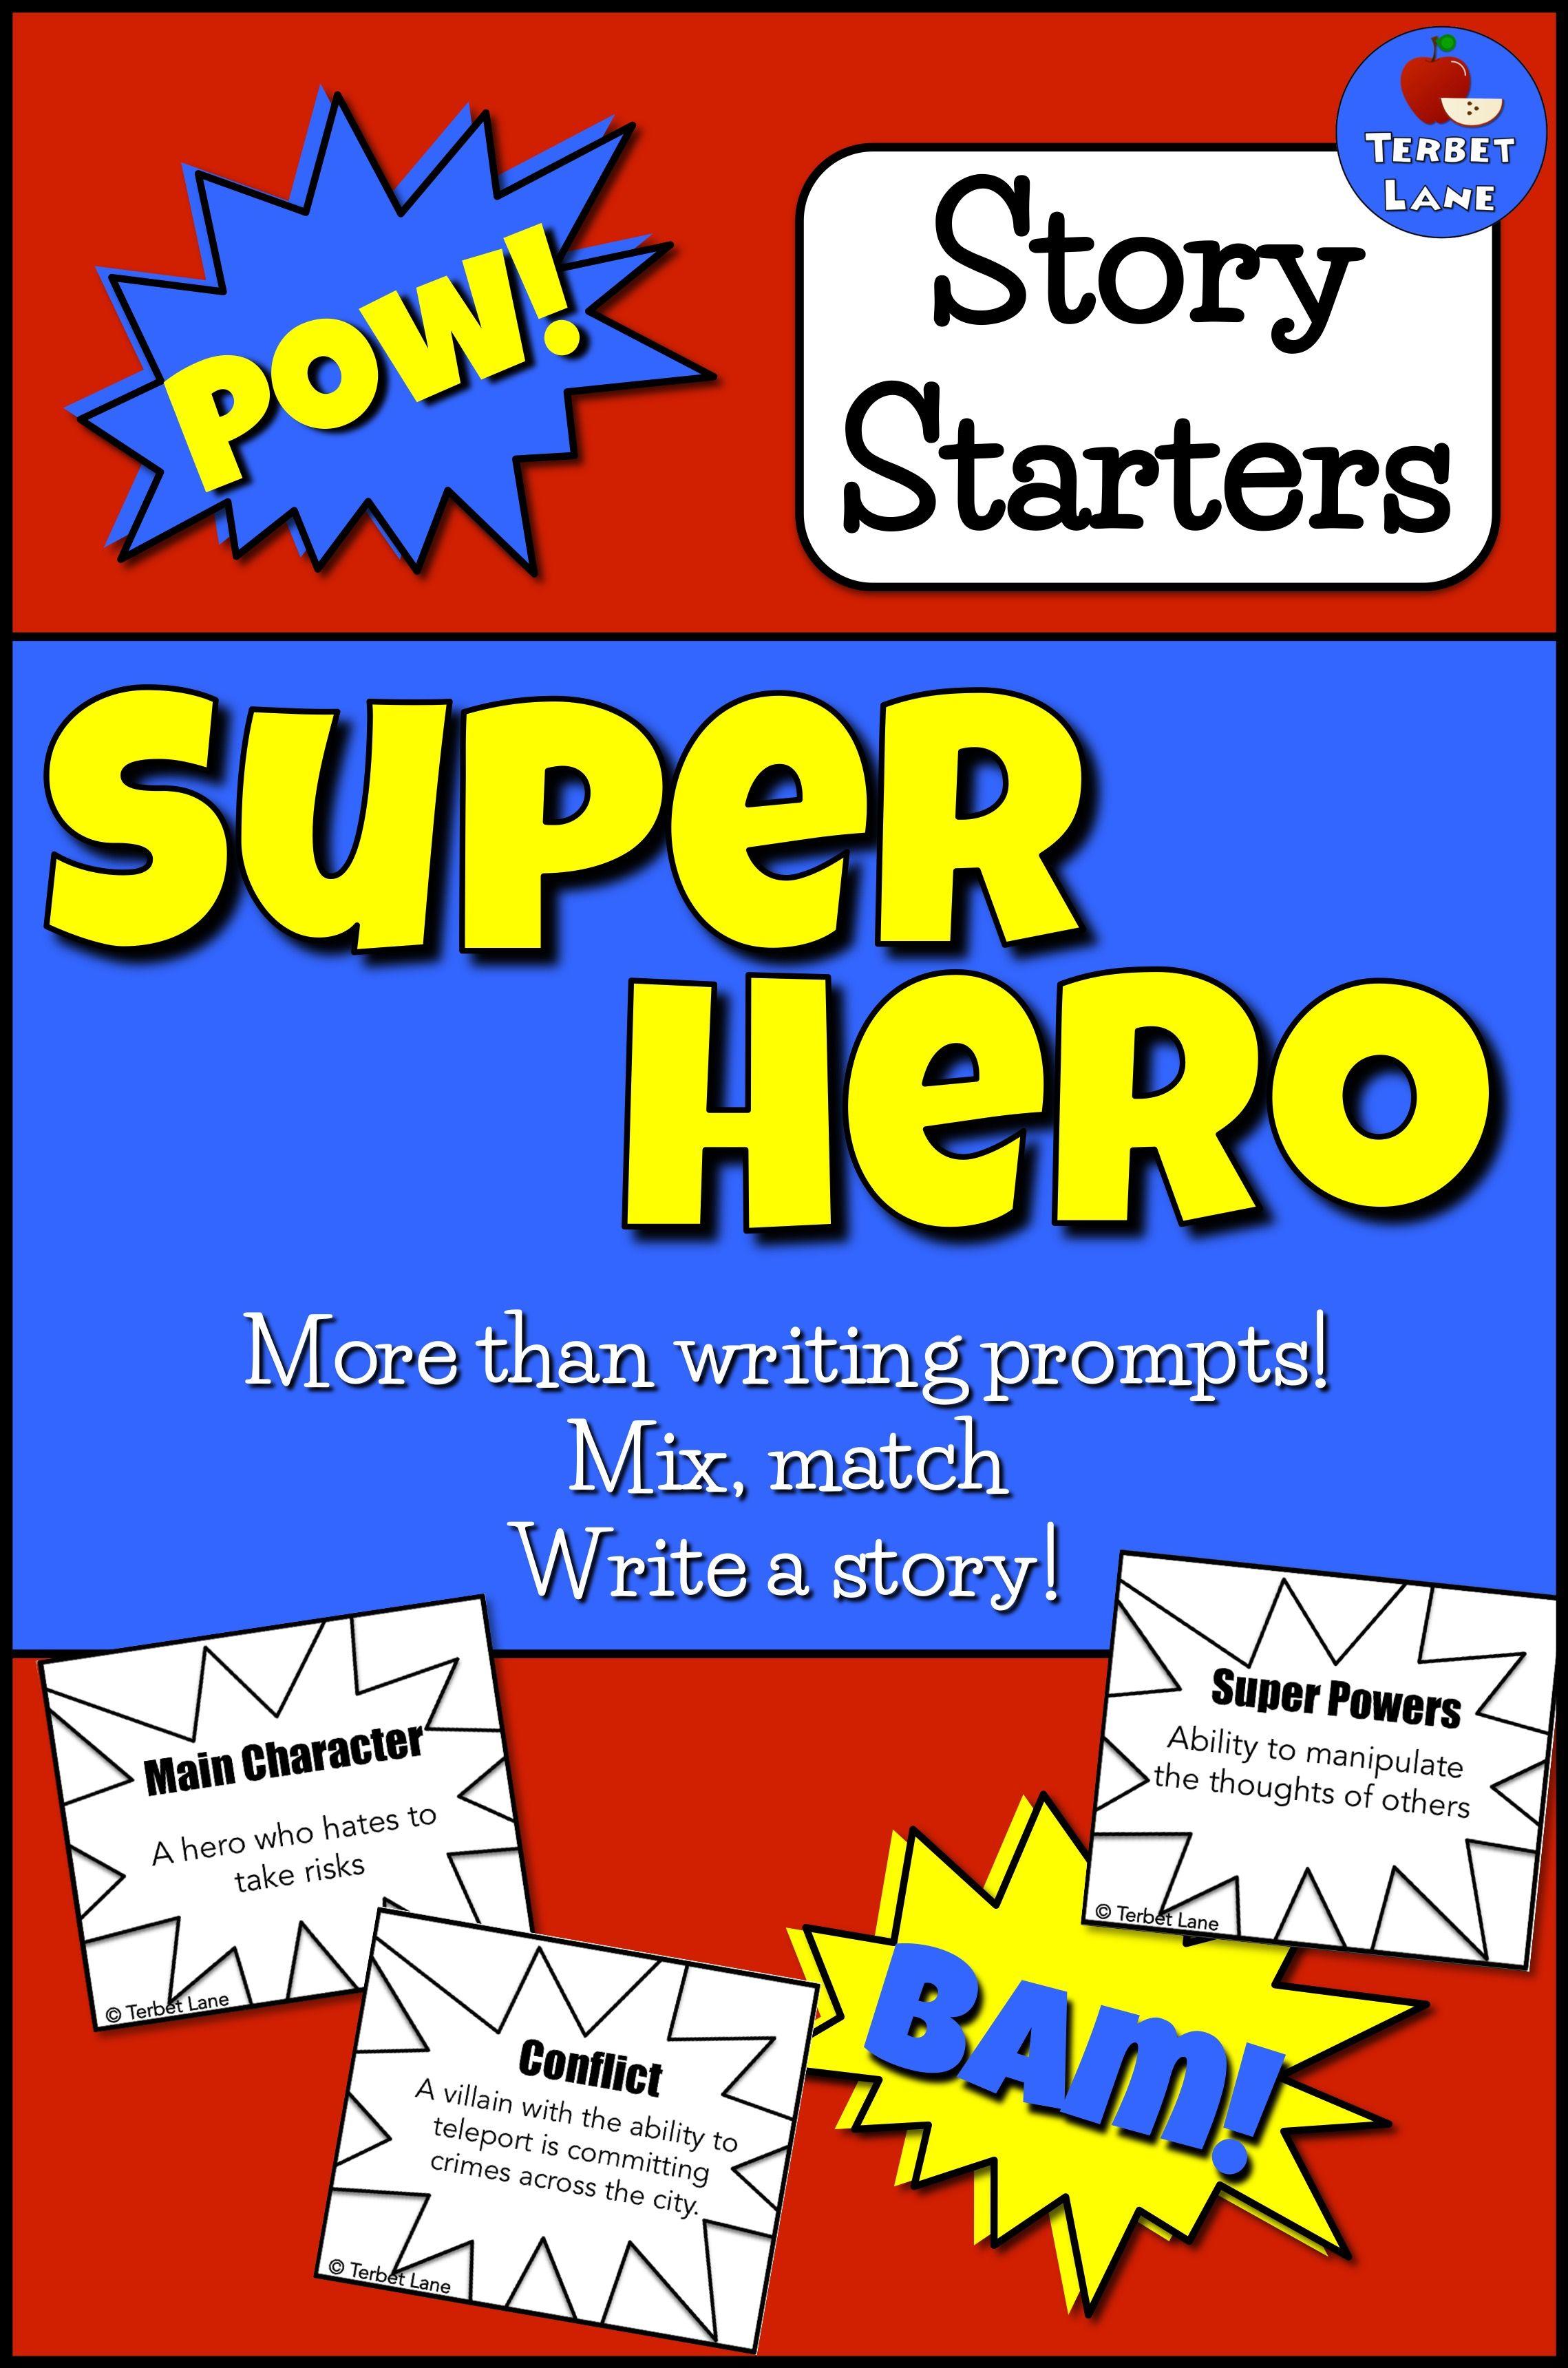 Superhero Theme Story Elements Creative Story Starter